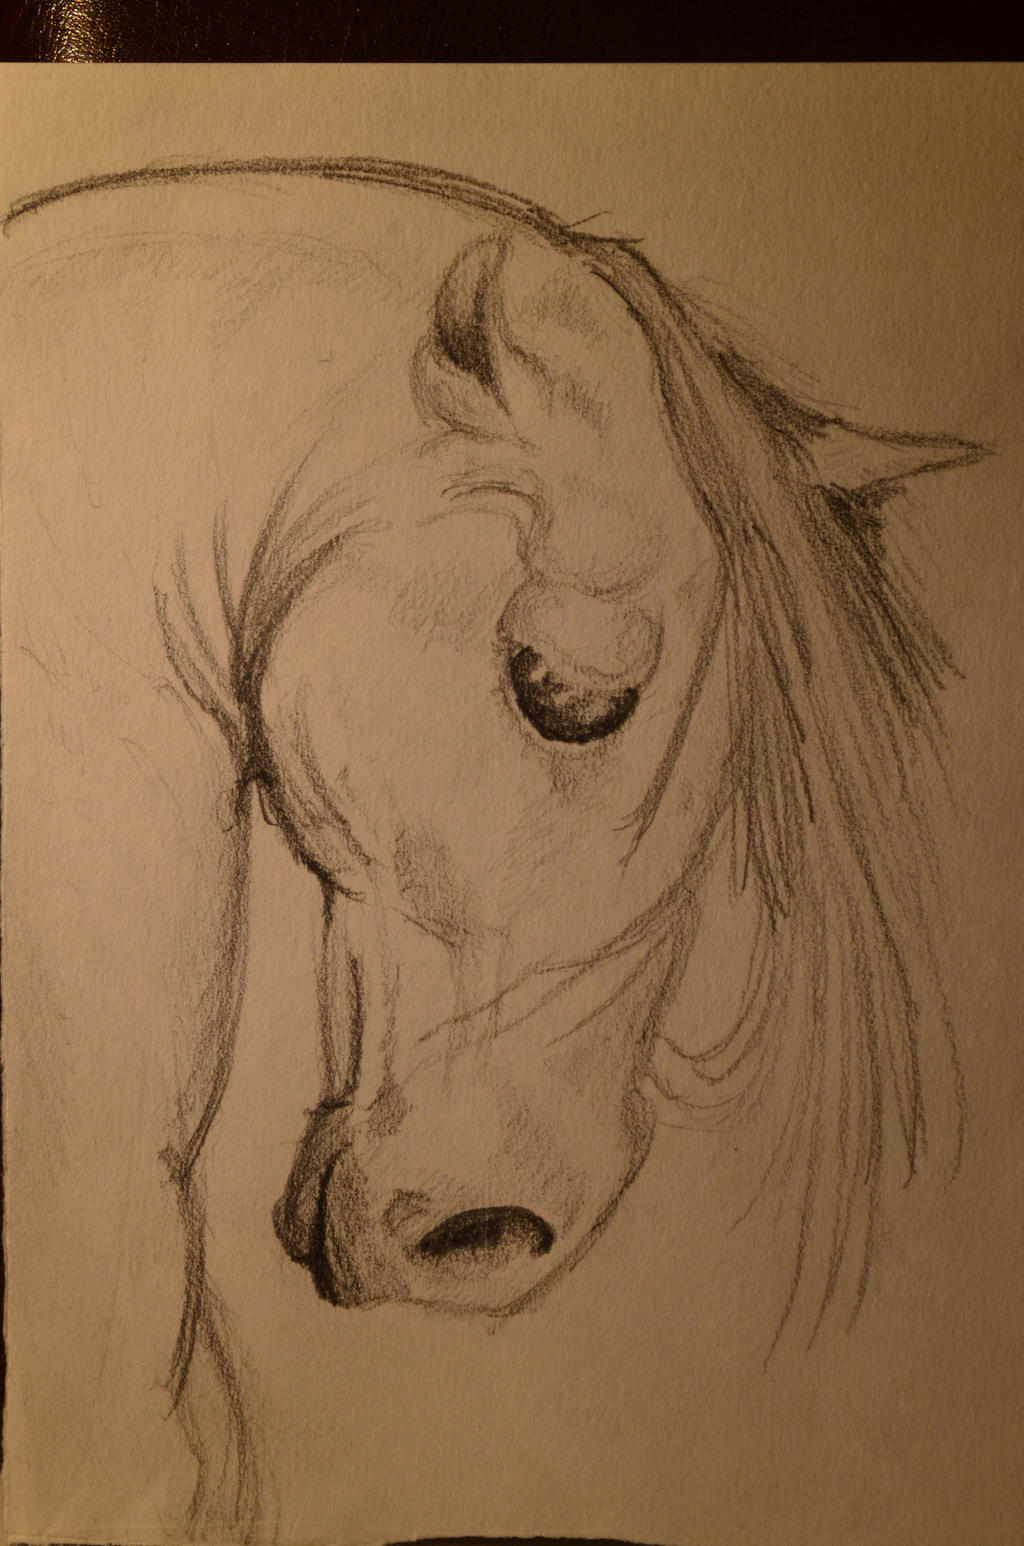 Horse by TheSuitedUnicorn